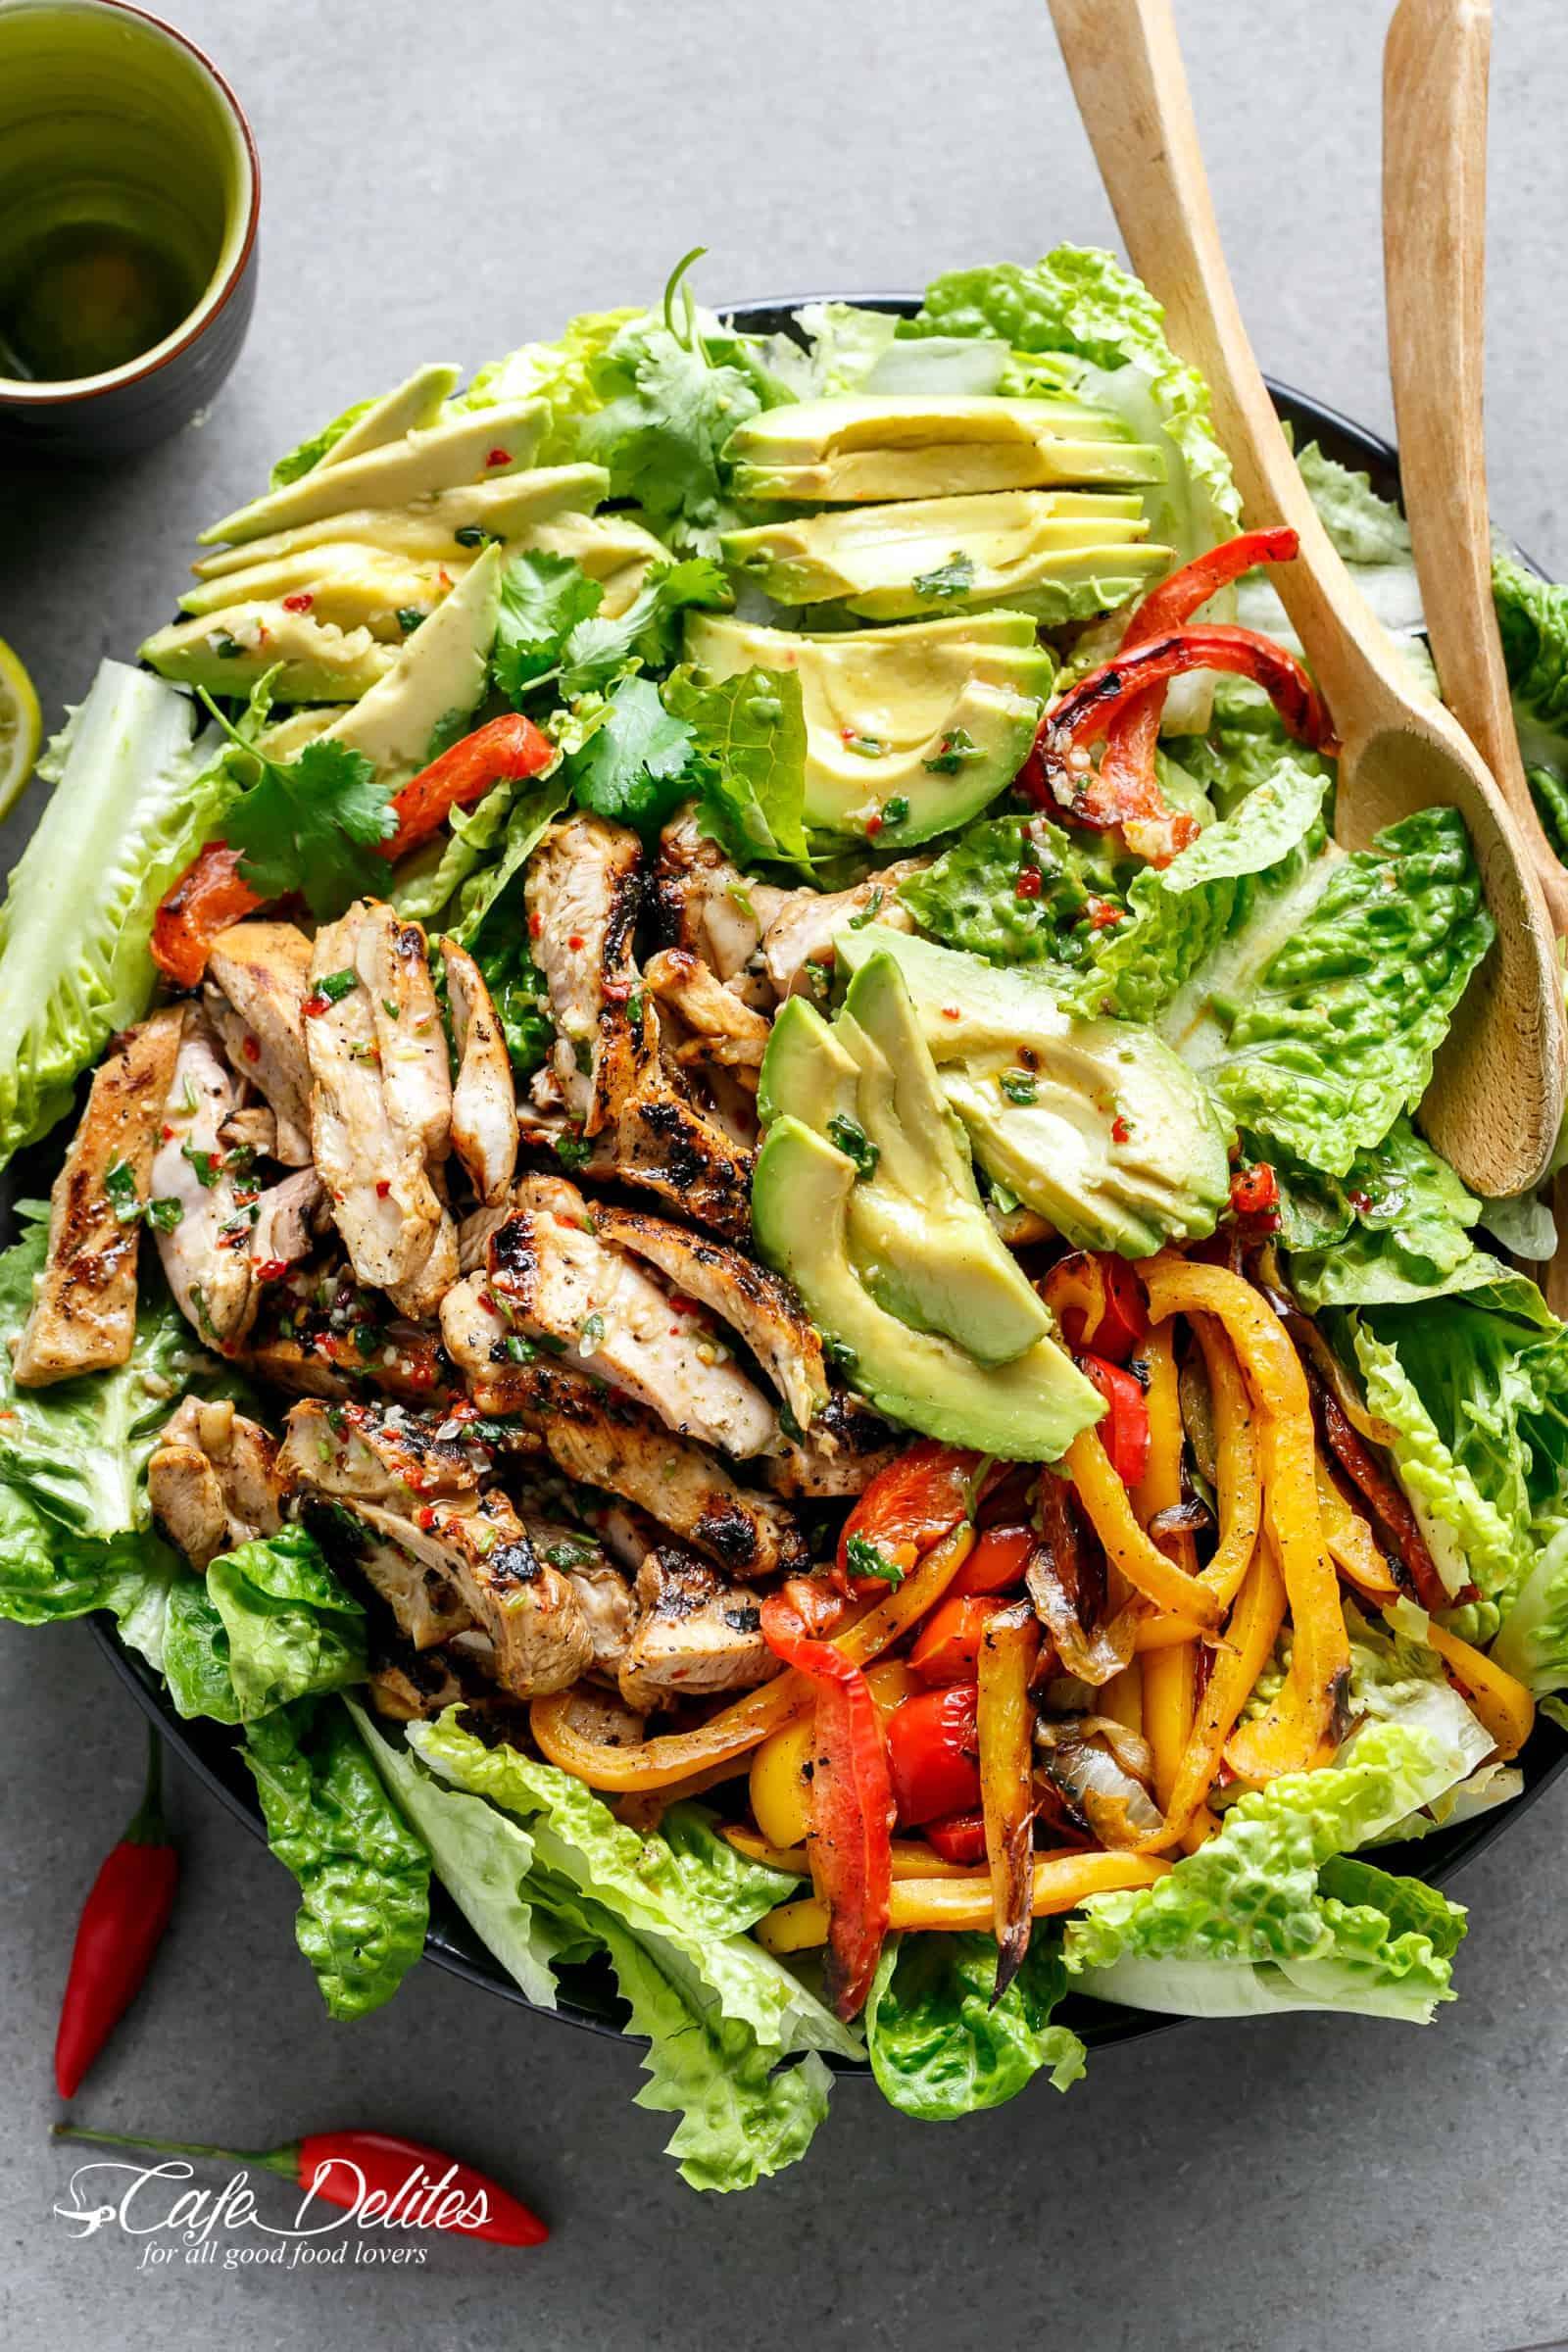 Grilled Chili Lime Chicken Fajita Salad